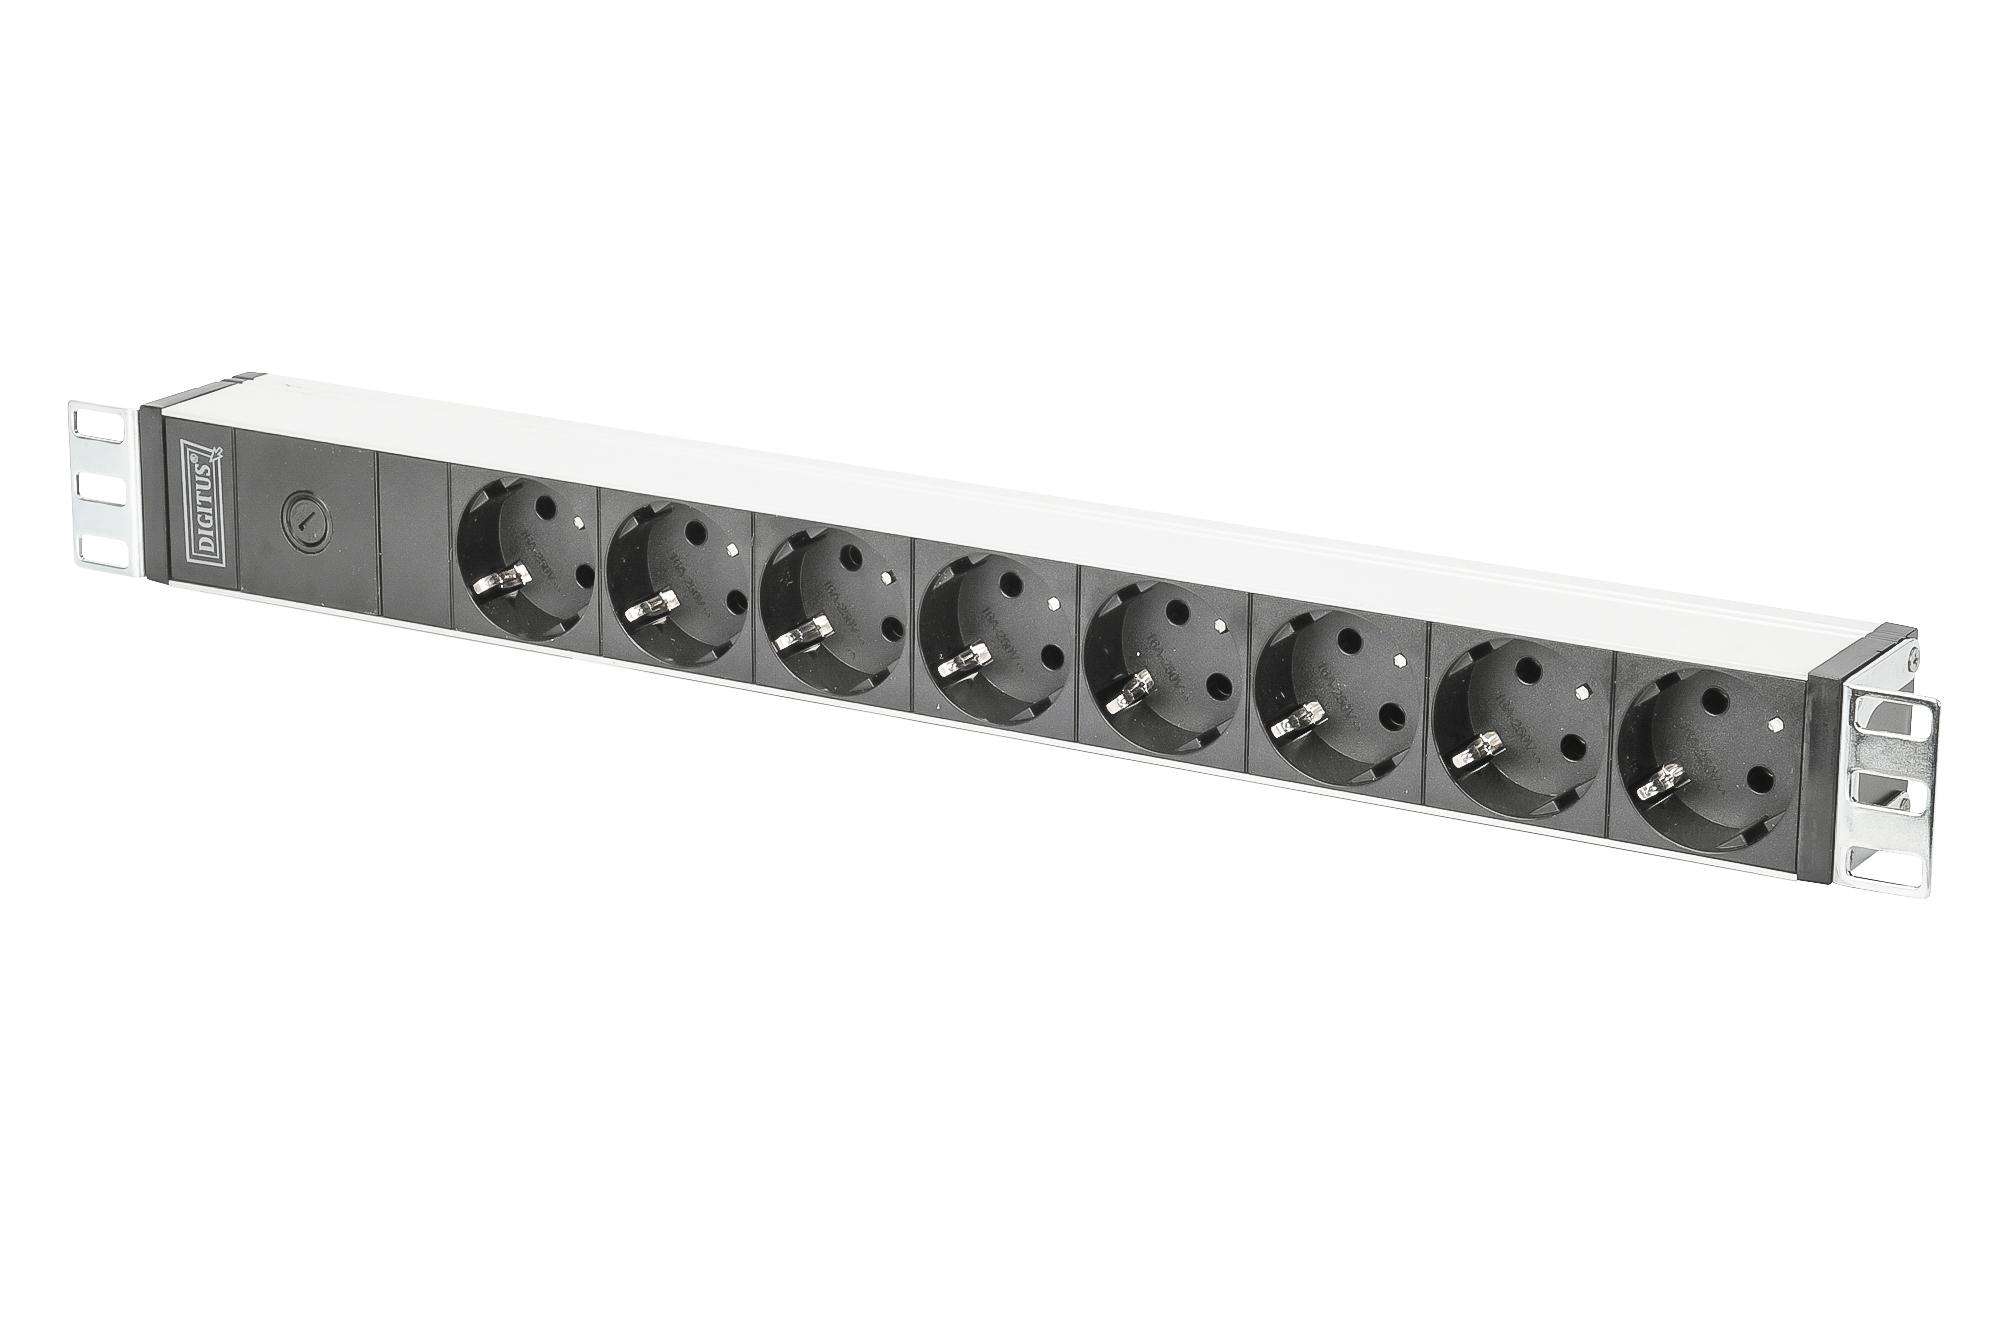 Multipresa digitus in alluminio 8 prese schuko tedesche cavo mt 2 con spina iec c14